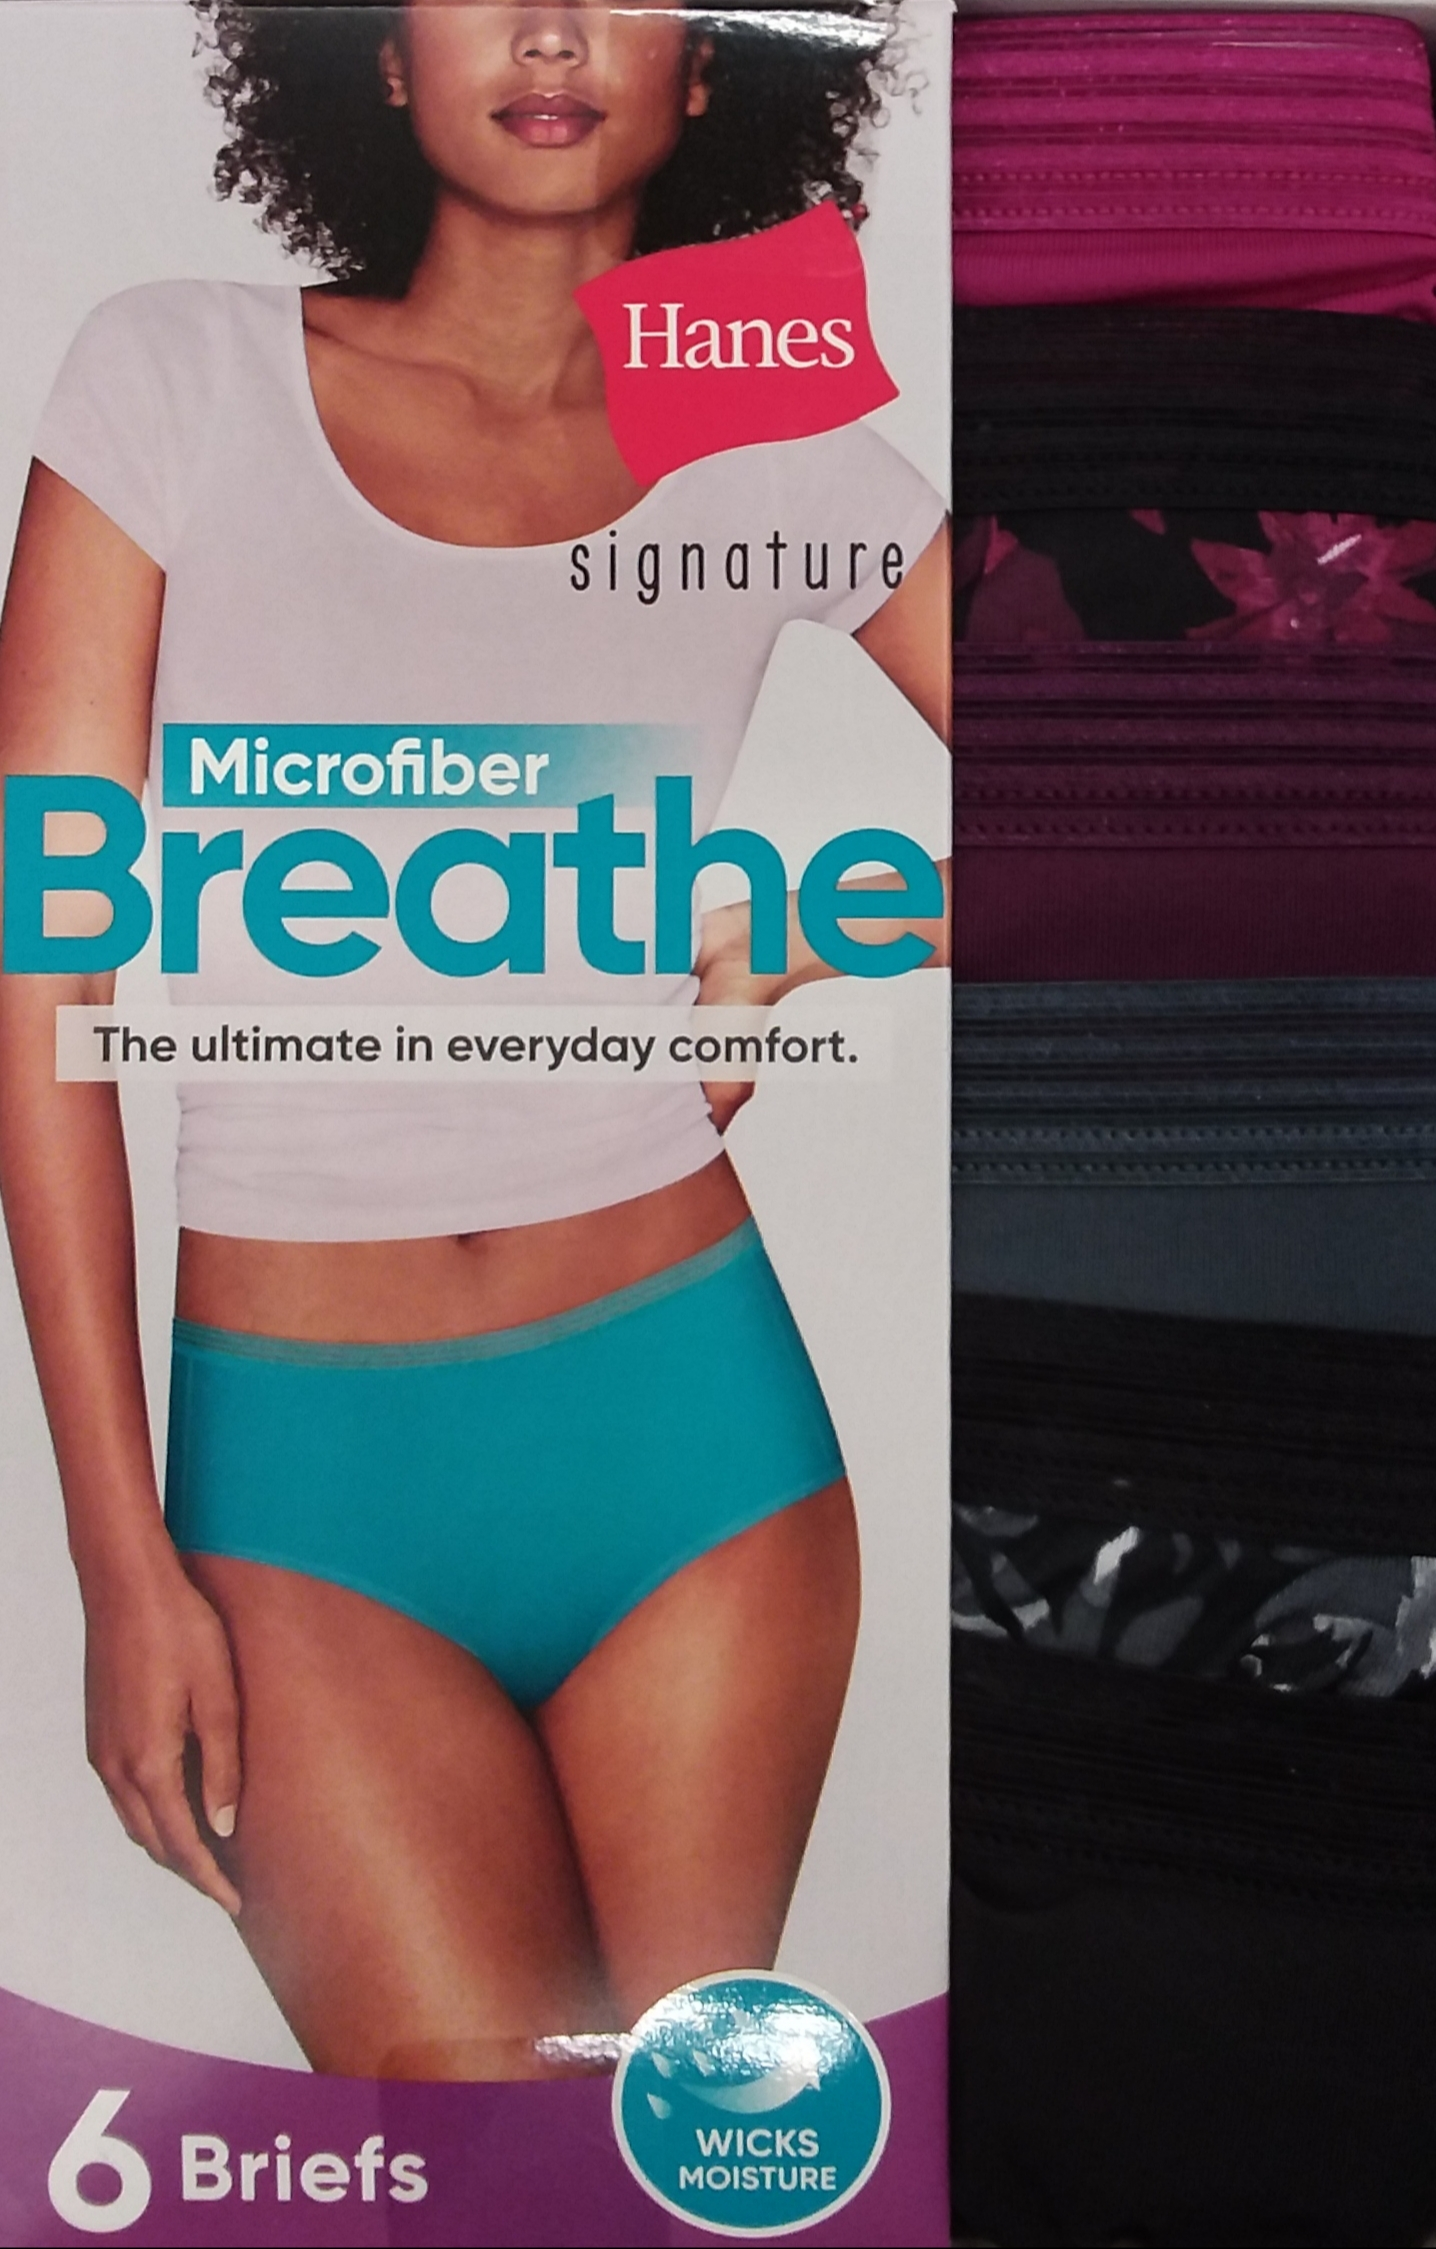 Hanes Womens Signature Microfiber Breathe Briefs 6-Pack